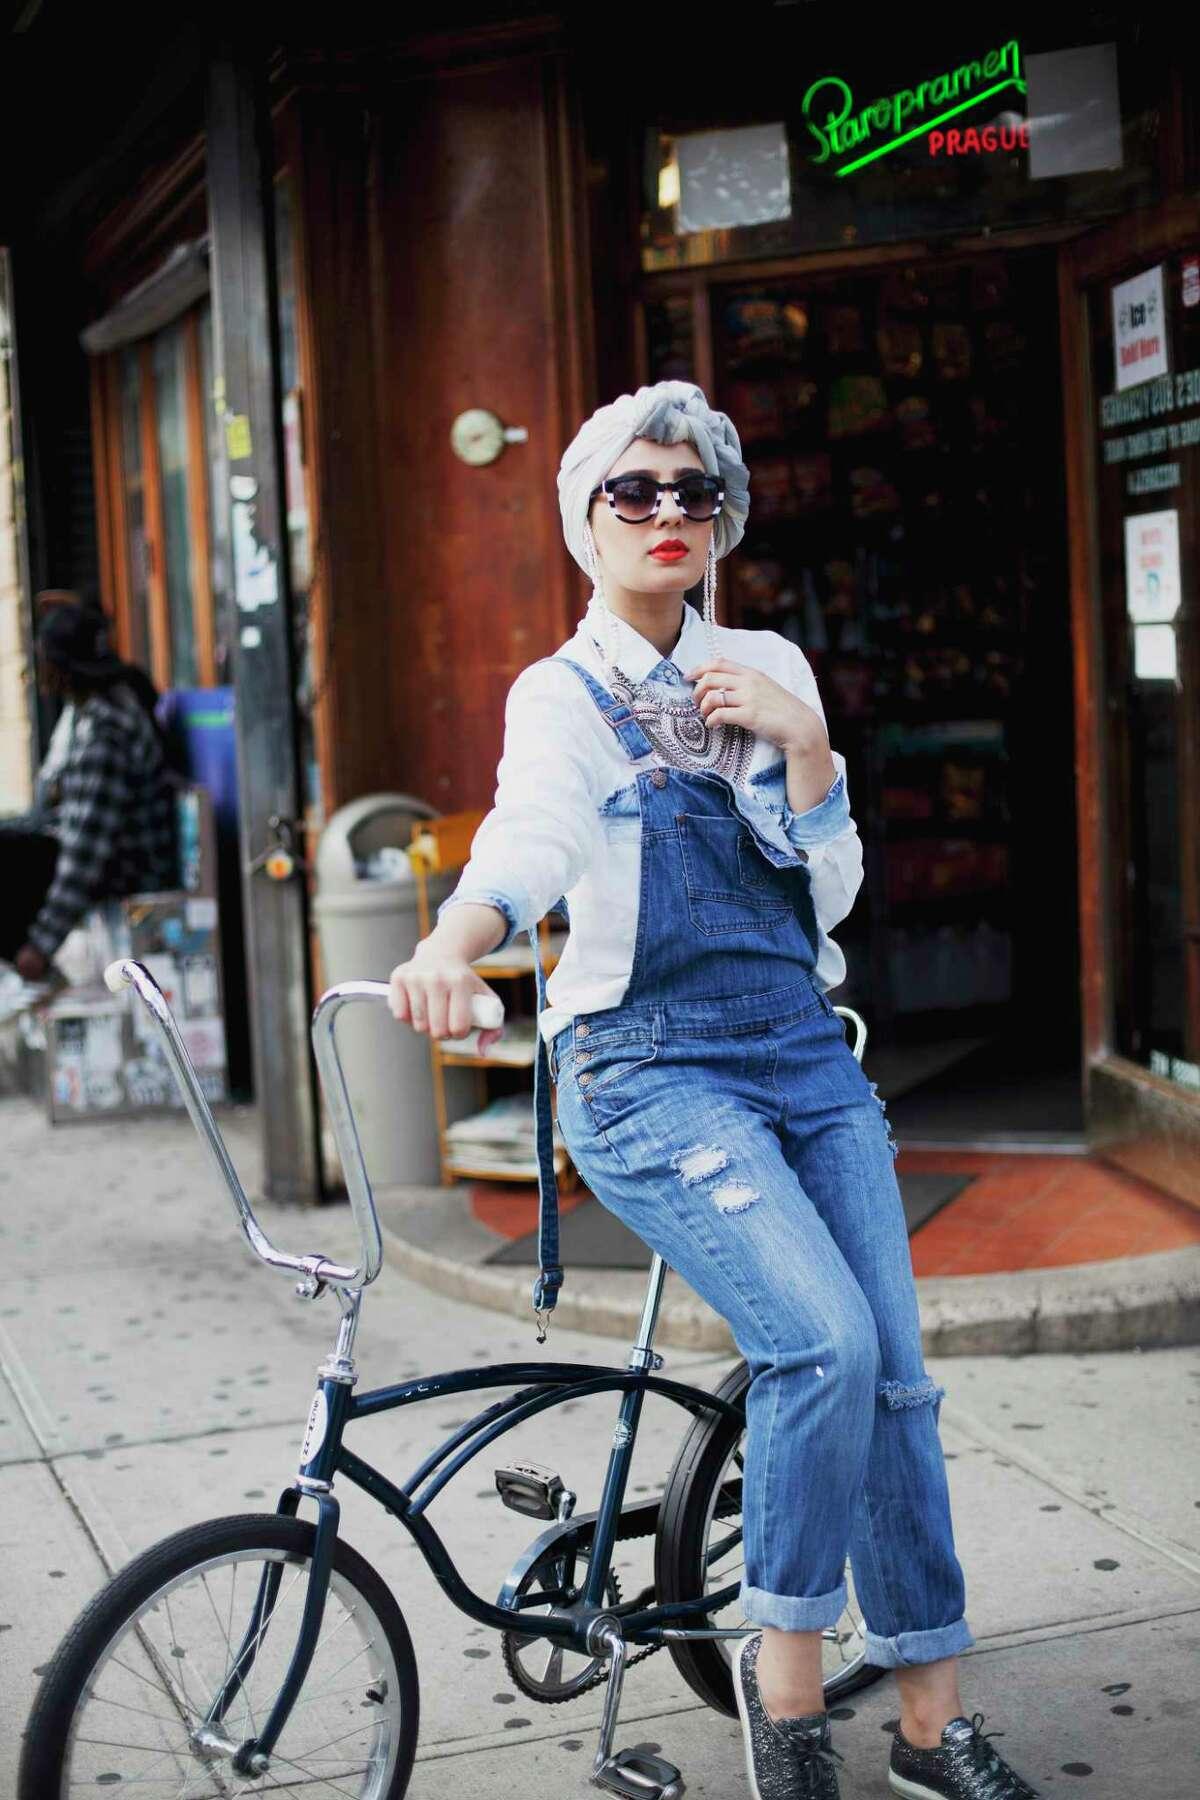 Ascia in Brooklyn, New York